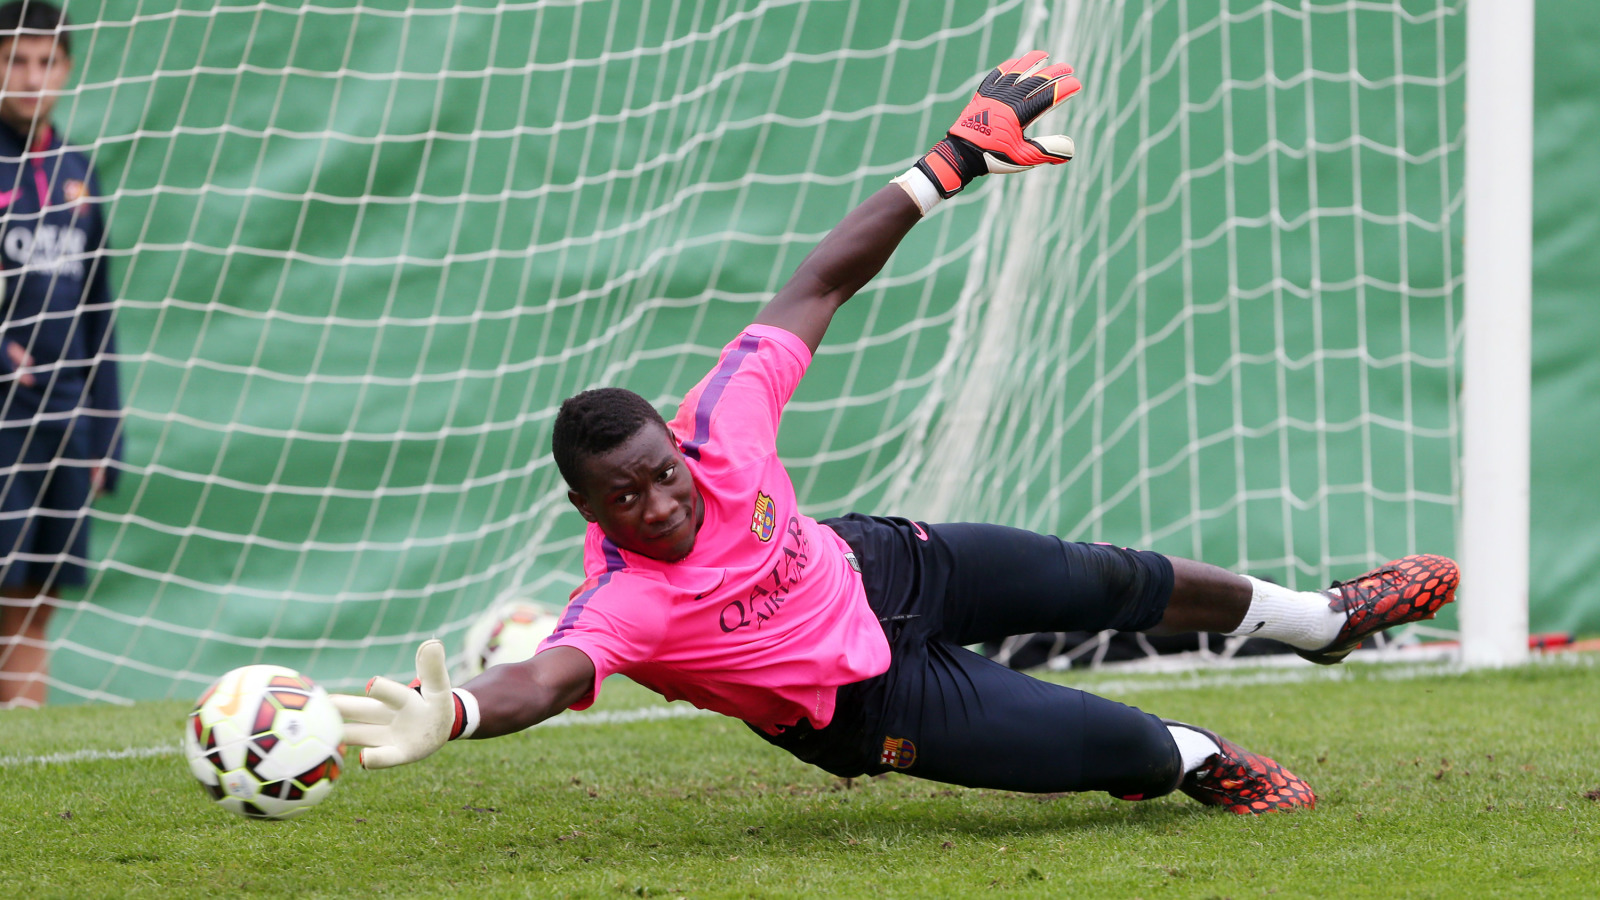 Barcelona looking to bring back former La Masia goalkeeper André Onana